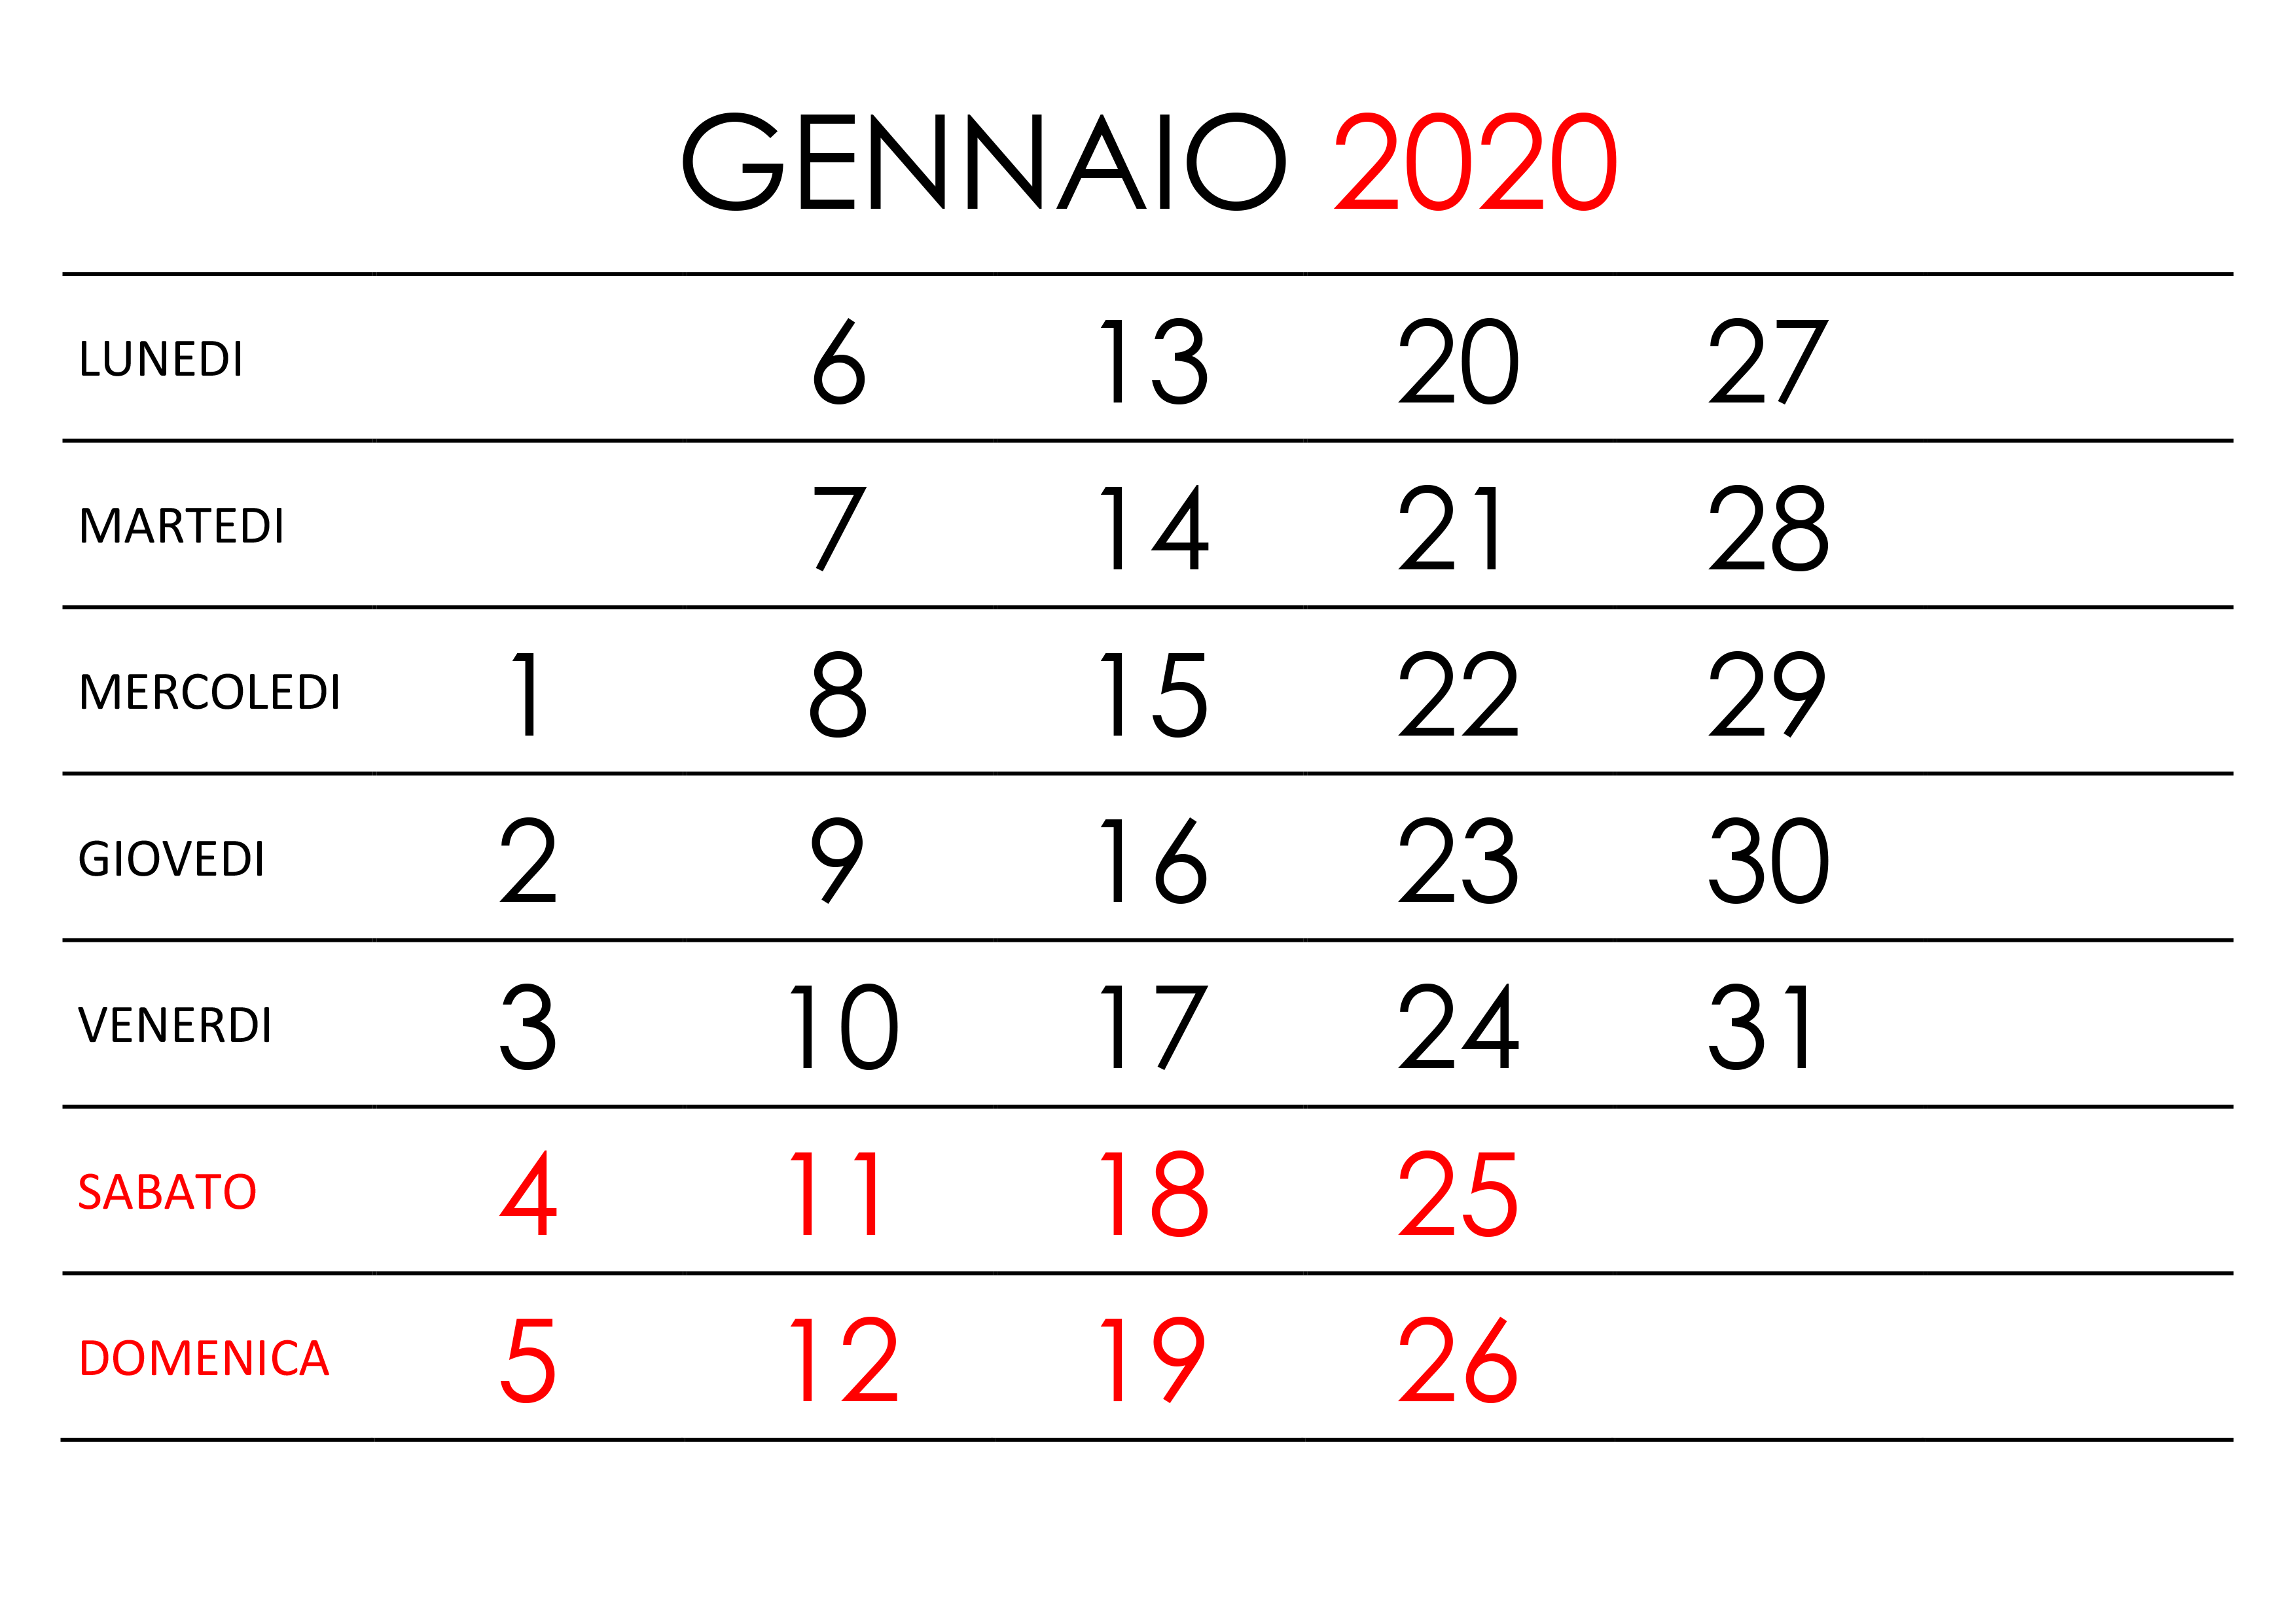 Calendario Gennaio 2020 Da Stampare.Calendario Gennaio 2020 Calendario Su